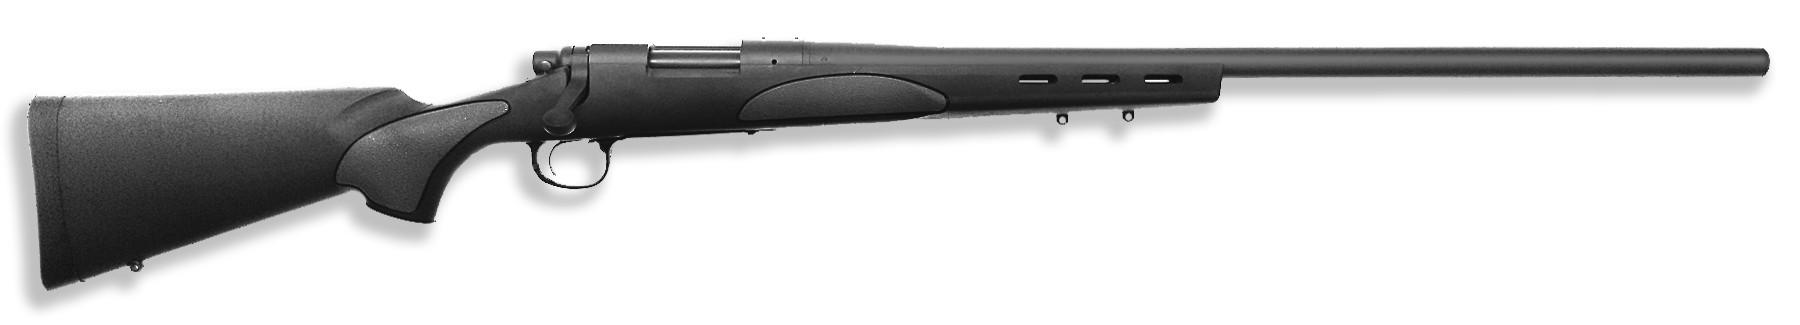 Repetierbüchse Remington 700 SPS Varmint Synthetic Stock Black .308 Win. Waffenstube Thalkirchen München Bayern Deutschland